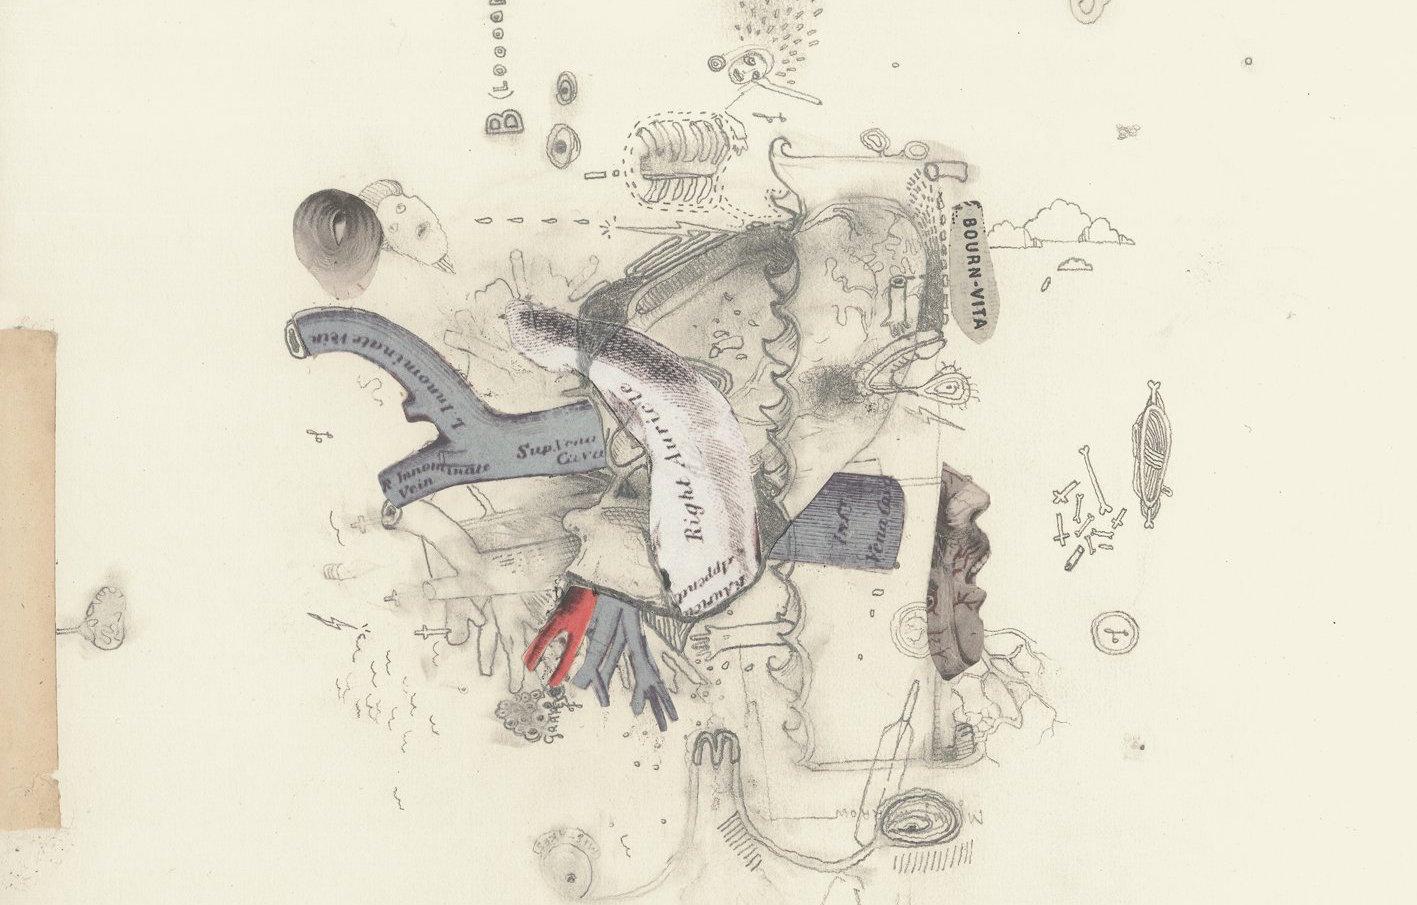 Looking back on Frightened Rabbit's 'The Midnight Organ Fight'